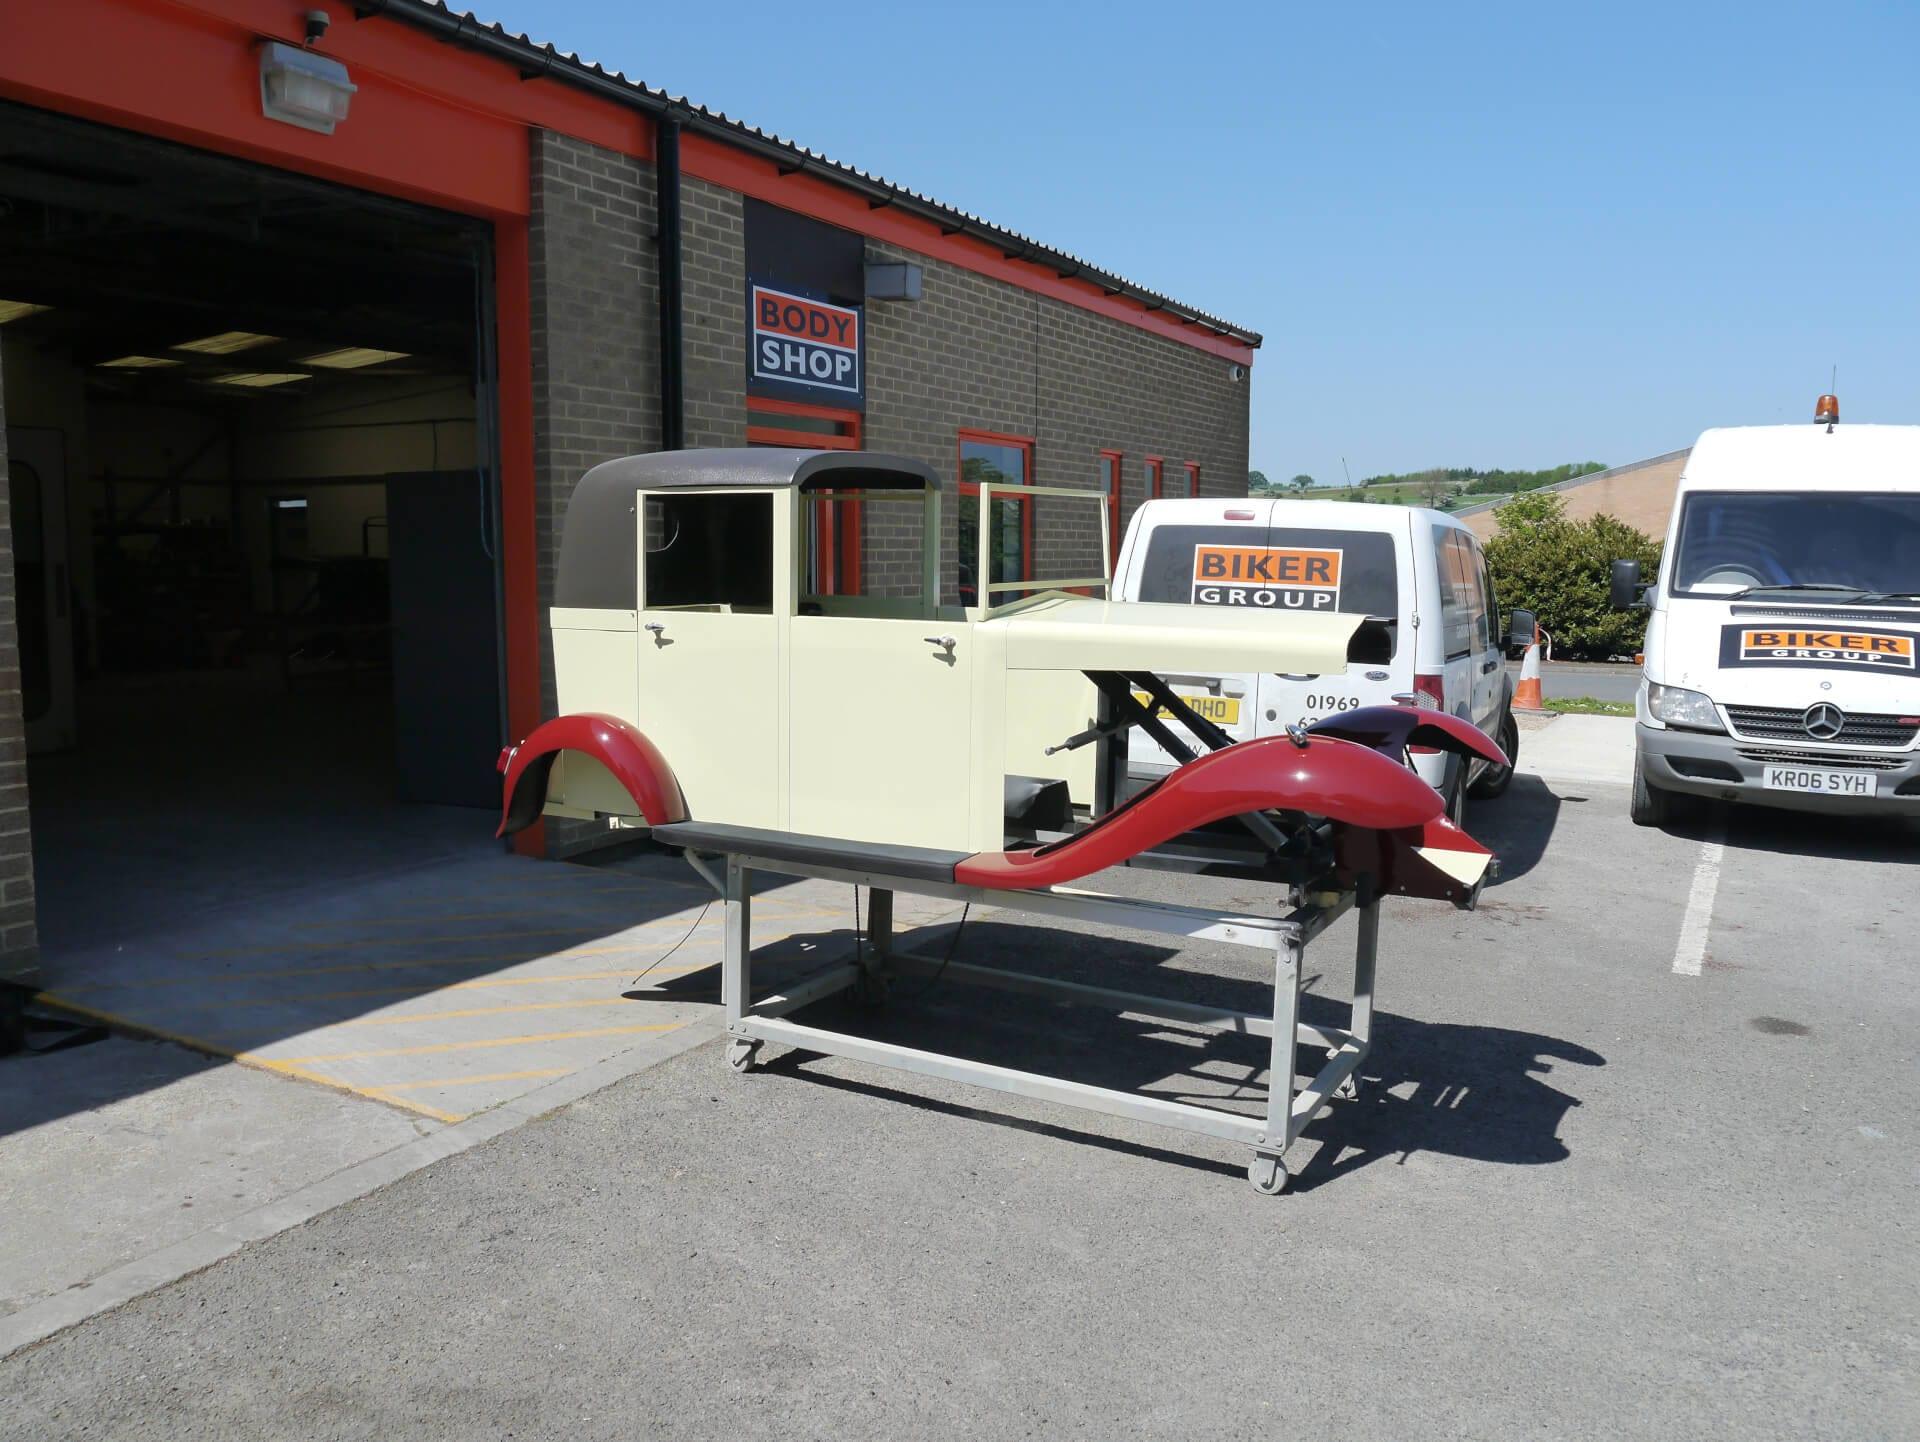 Biker car shop restore bugsy malone classic car